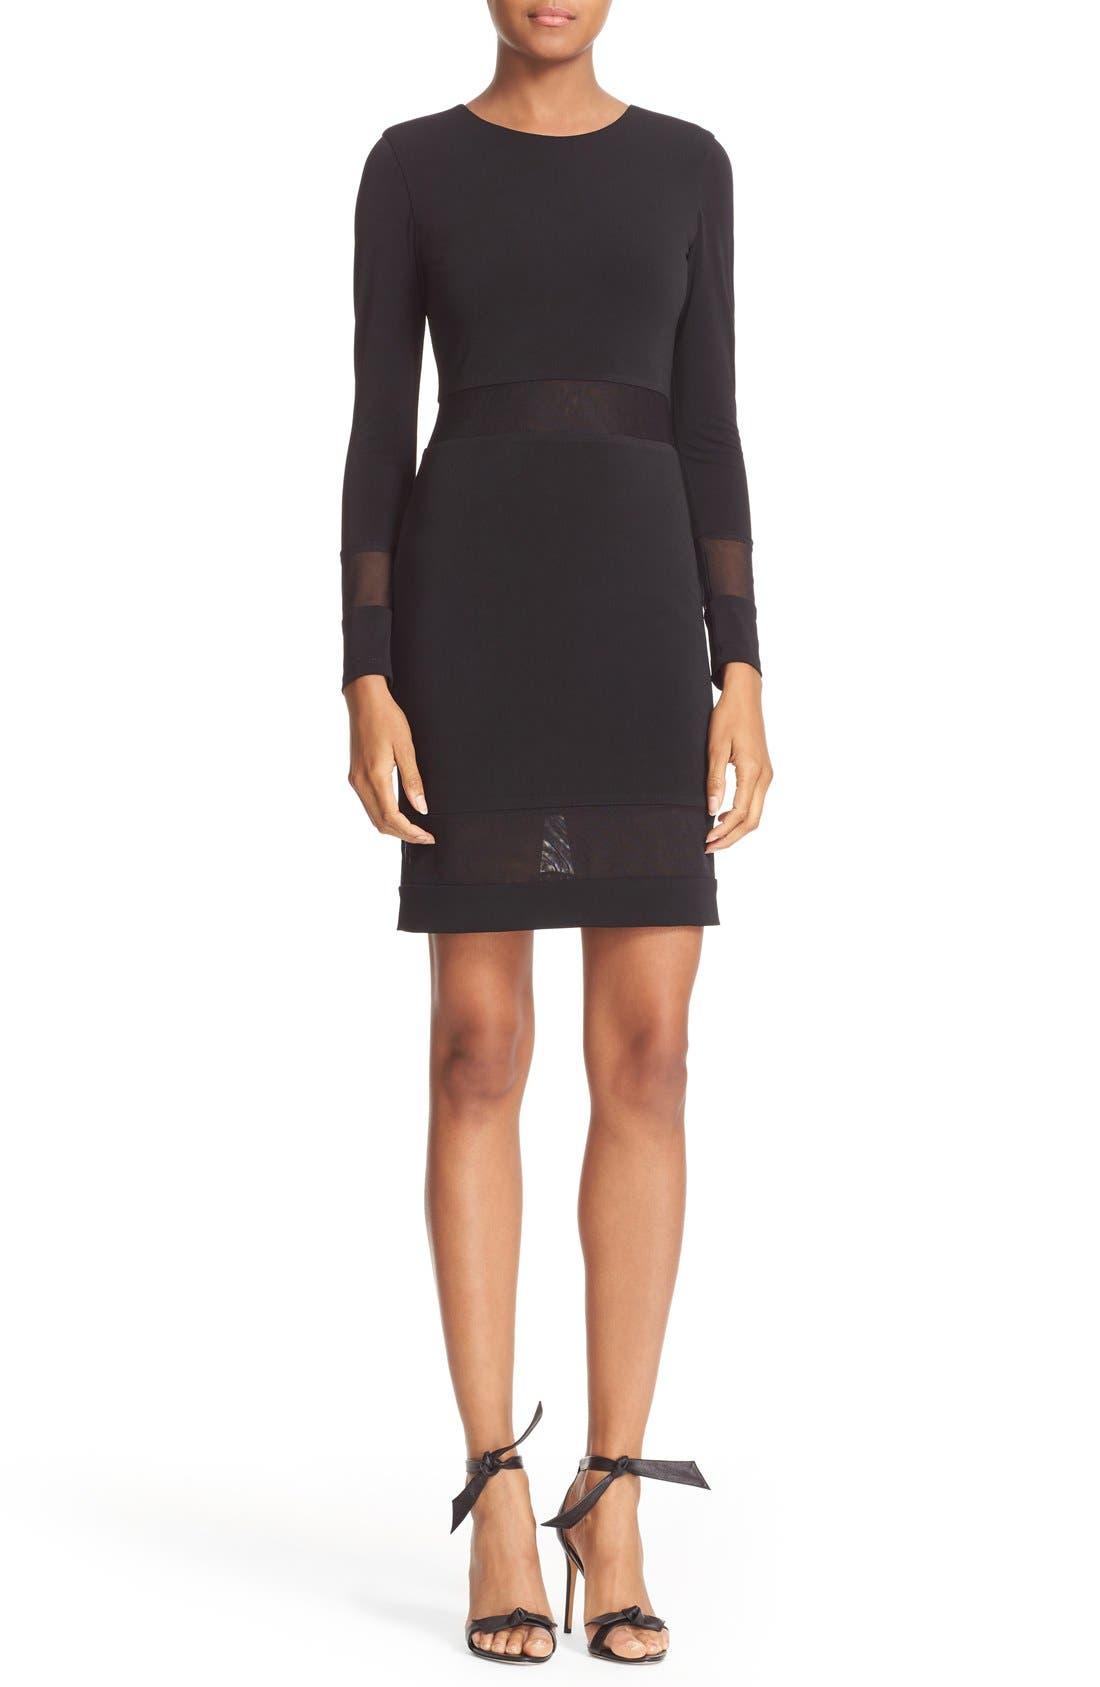 Alternate Image 1 Selected - Alice + Olivia Madie Mesh Panel Body-Con Dress